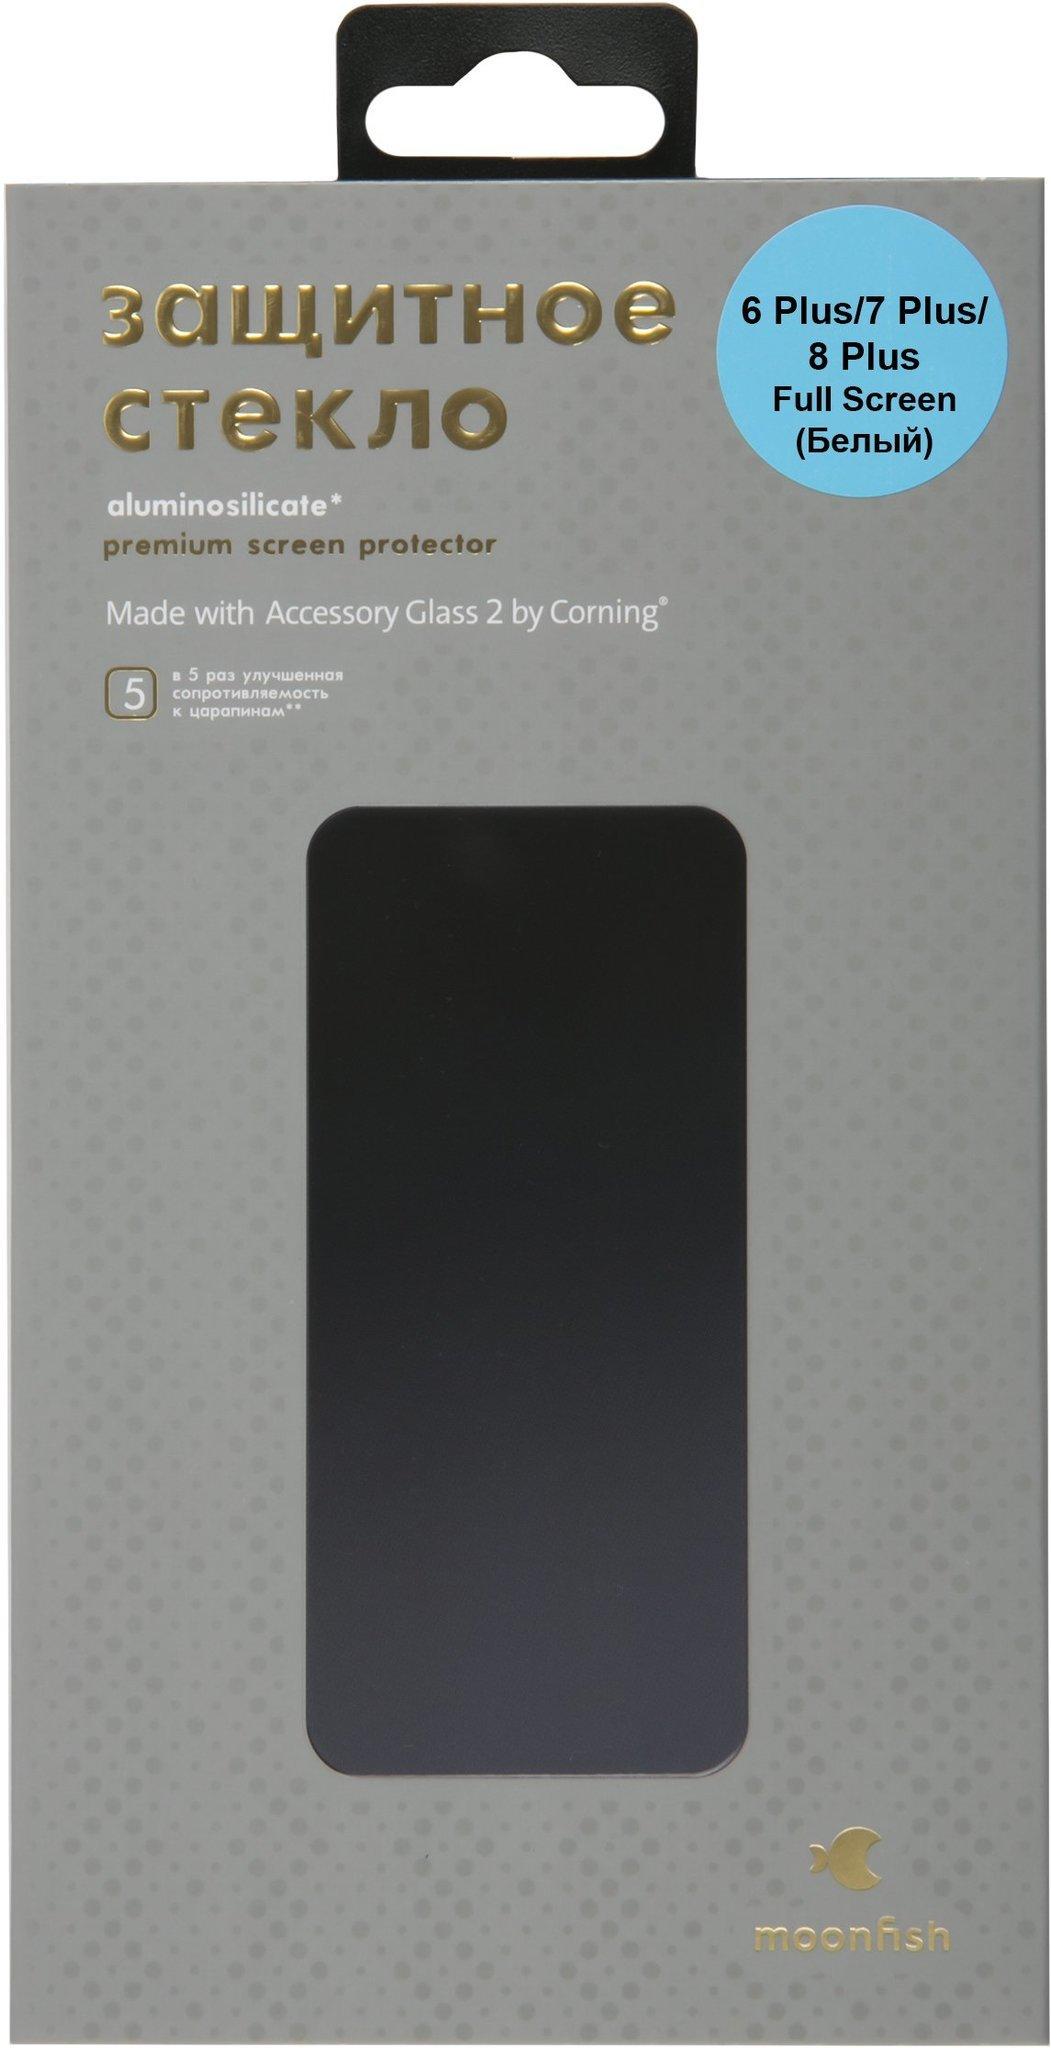 Защитное 3D стекло для iPhone 8 Plus / 7 Plus / 6s Plus 6__7__8_.jpg